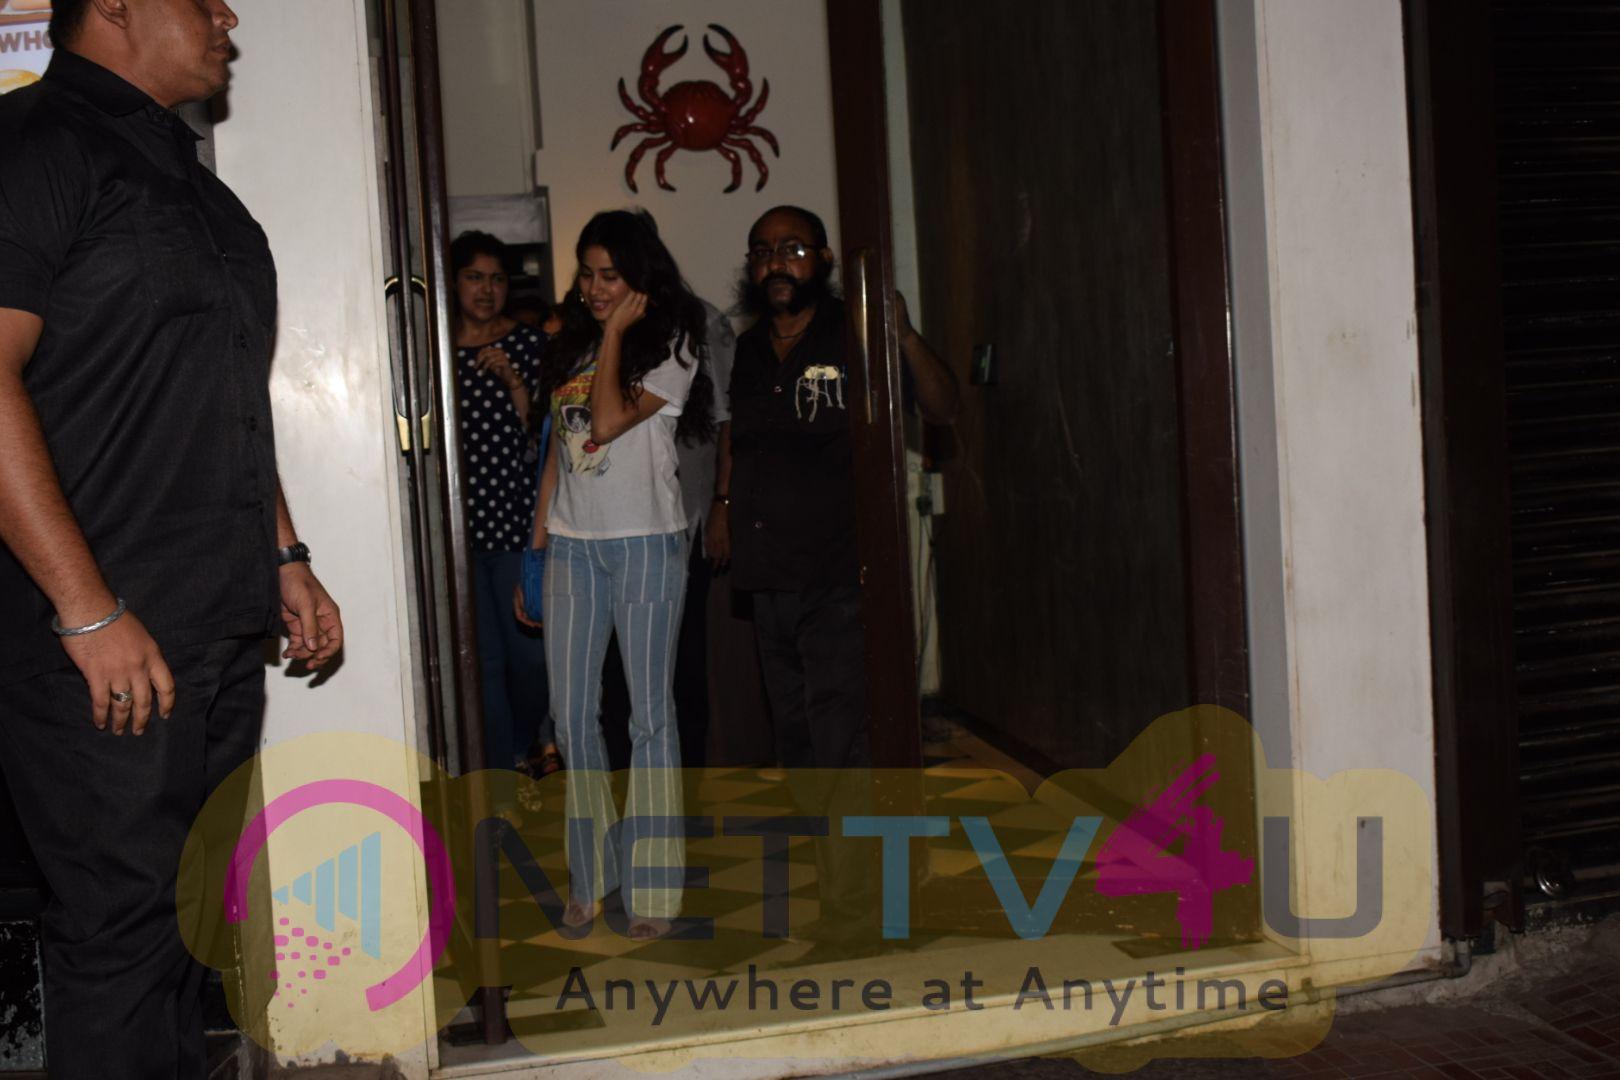 Boney, Janhvi & Khushi Kapoor Spotted At Bastian In Bandra Pics